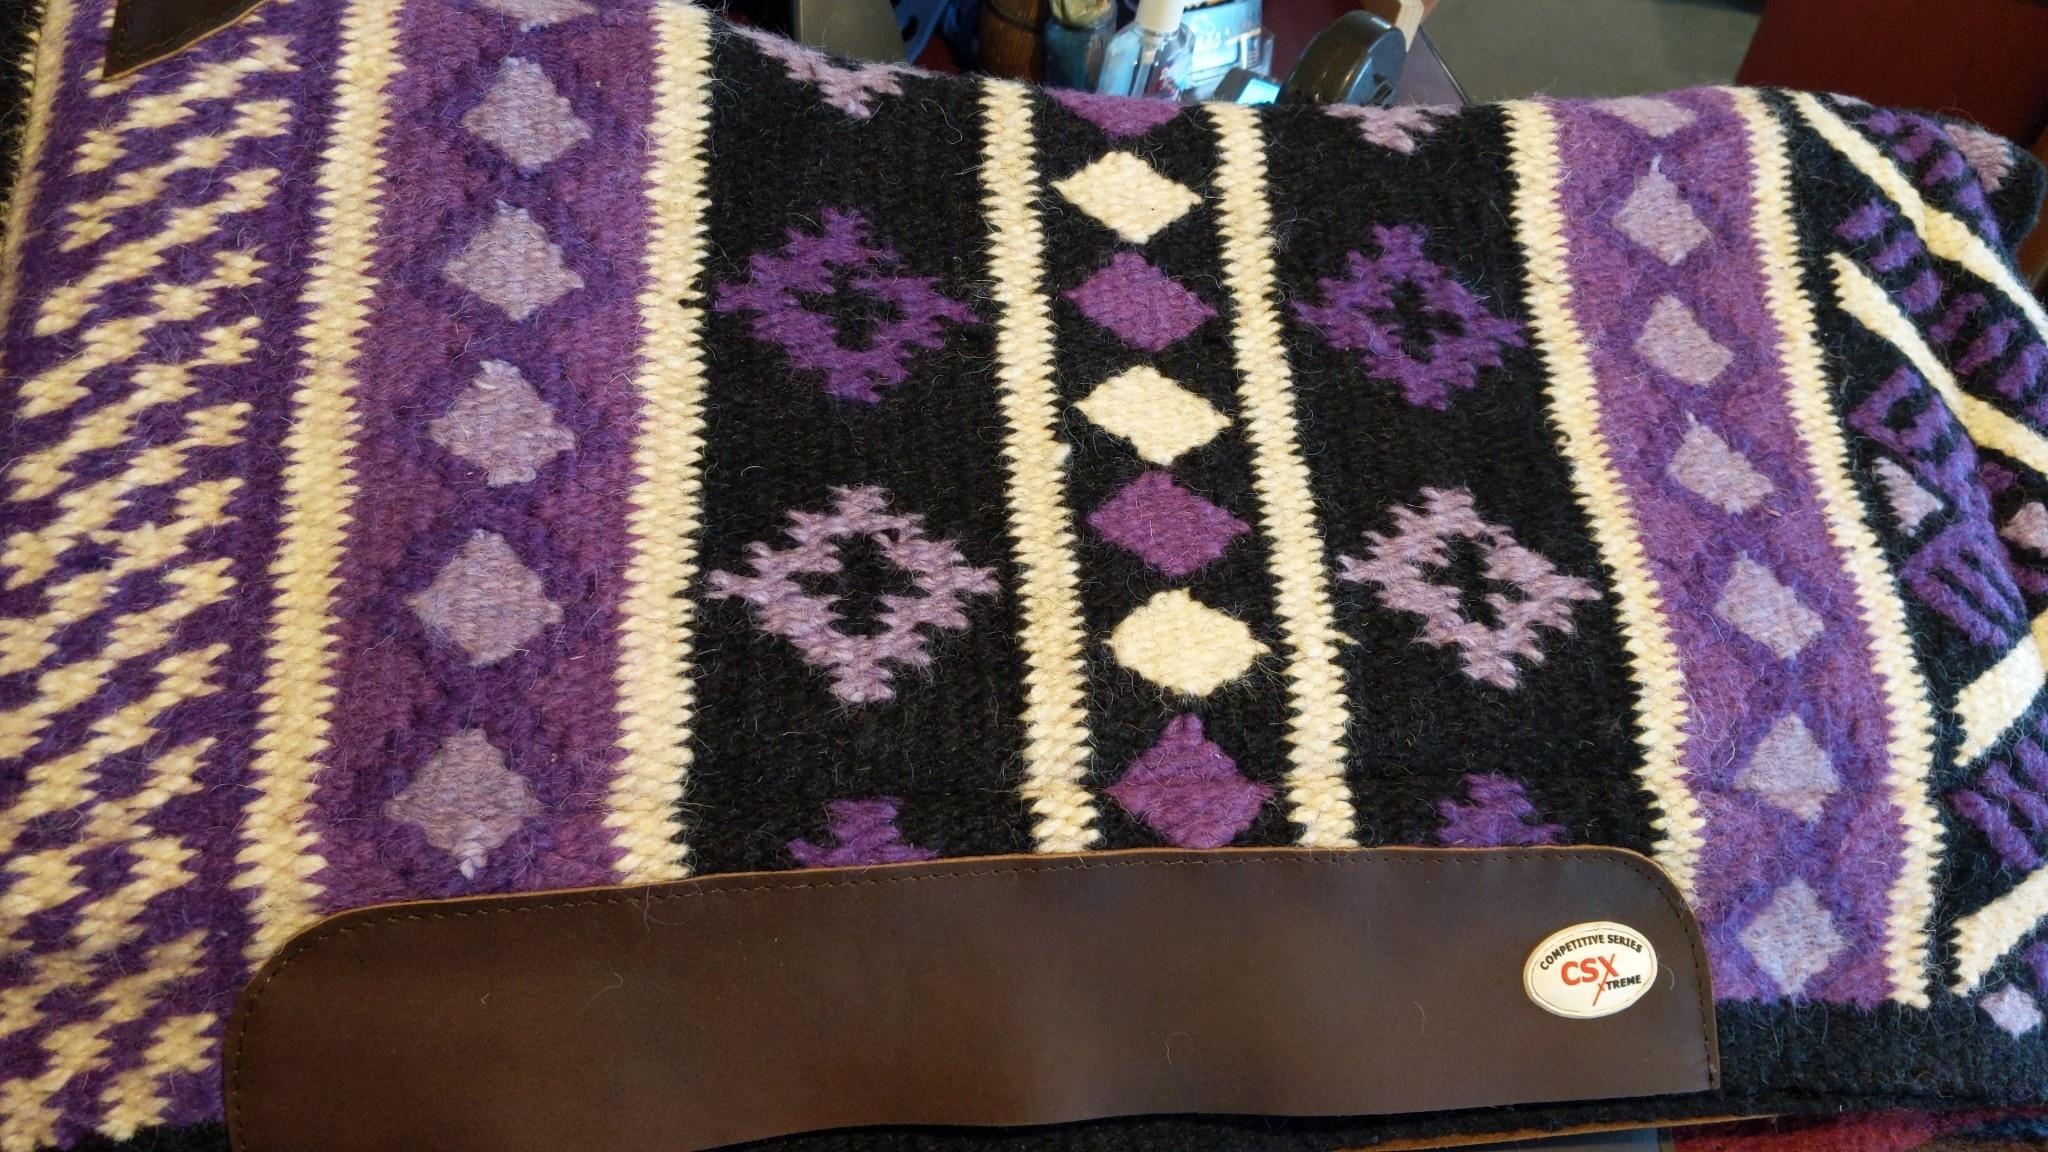 CSX Saddle Pad - Wool Top